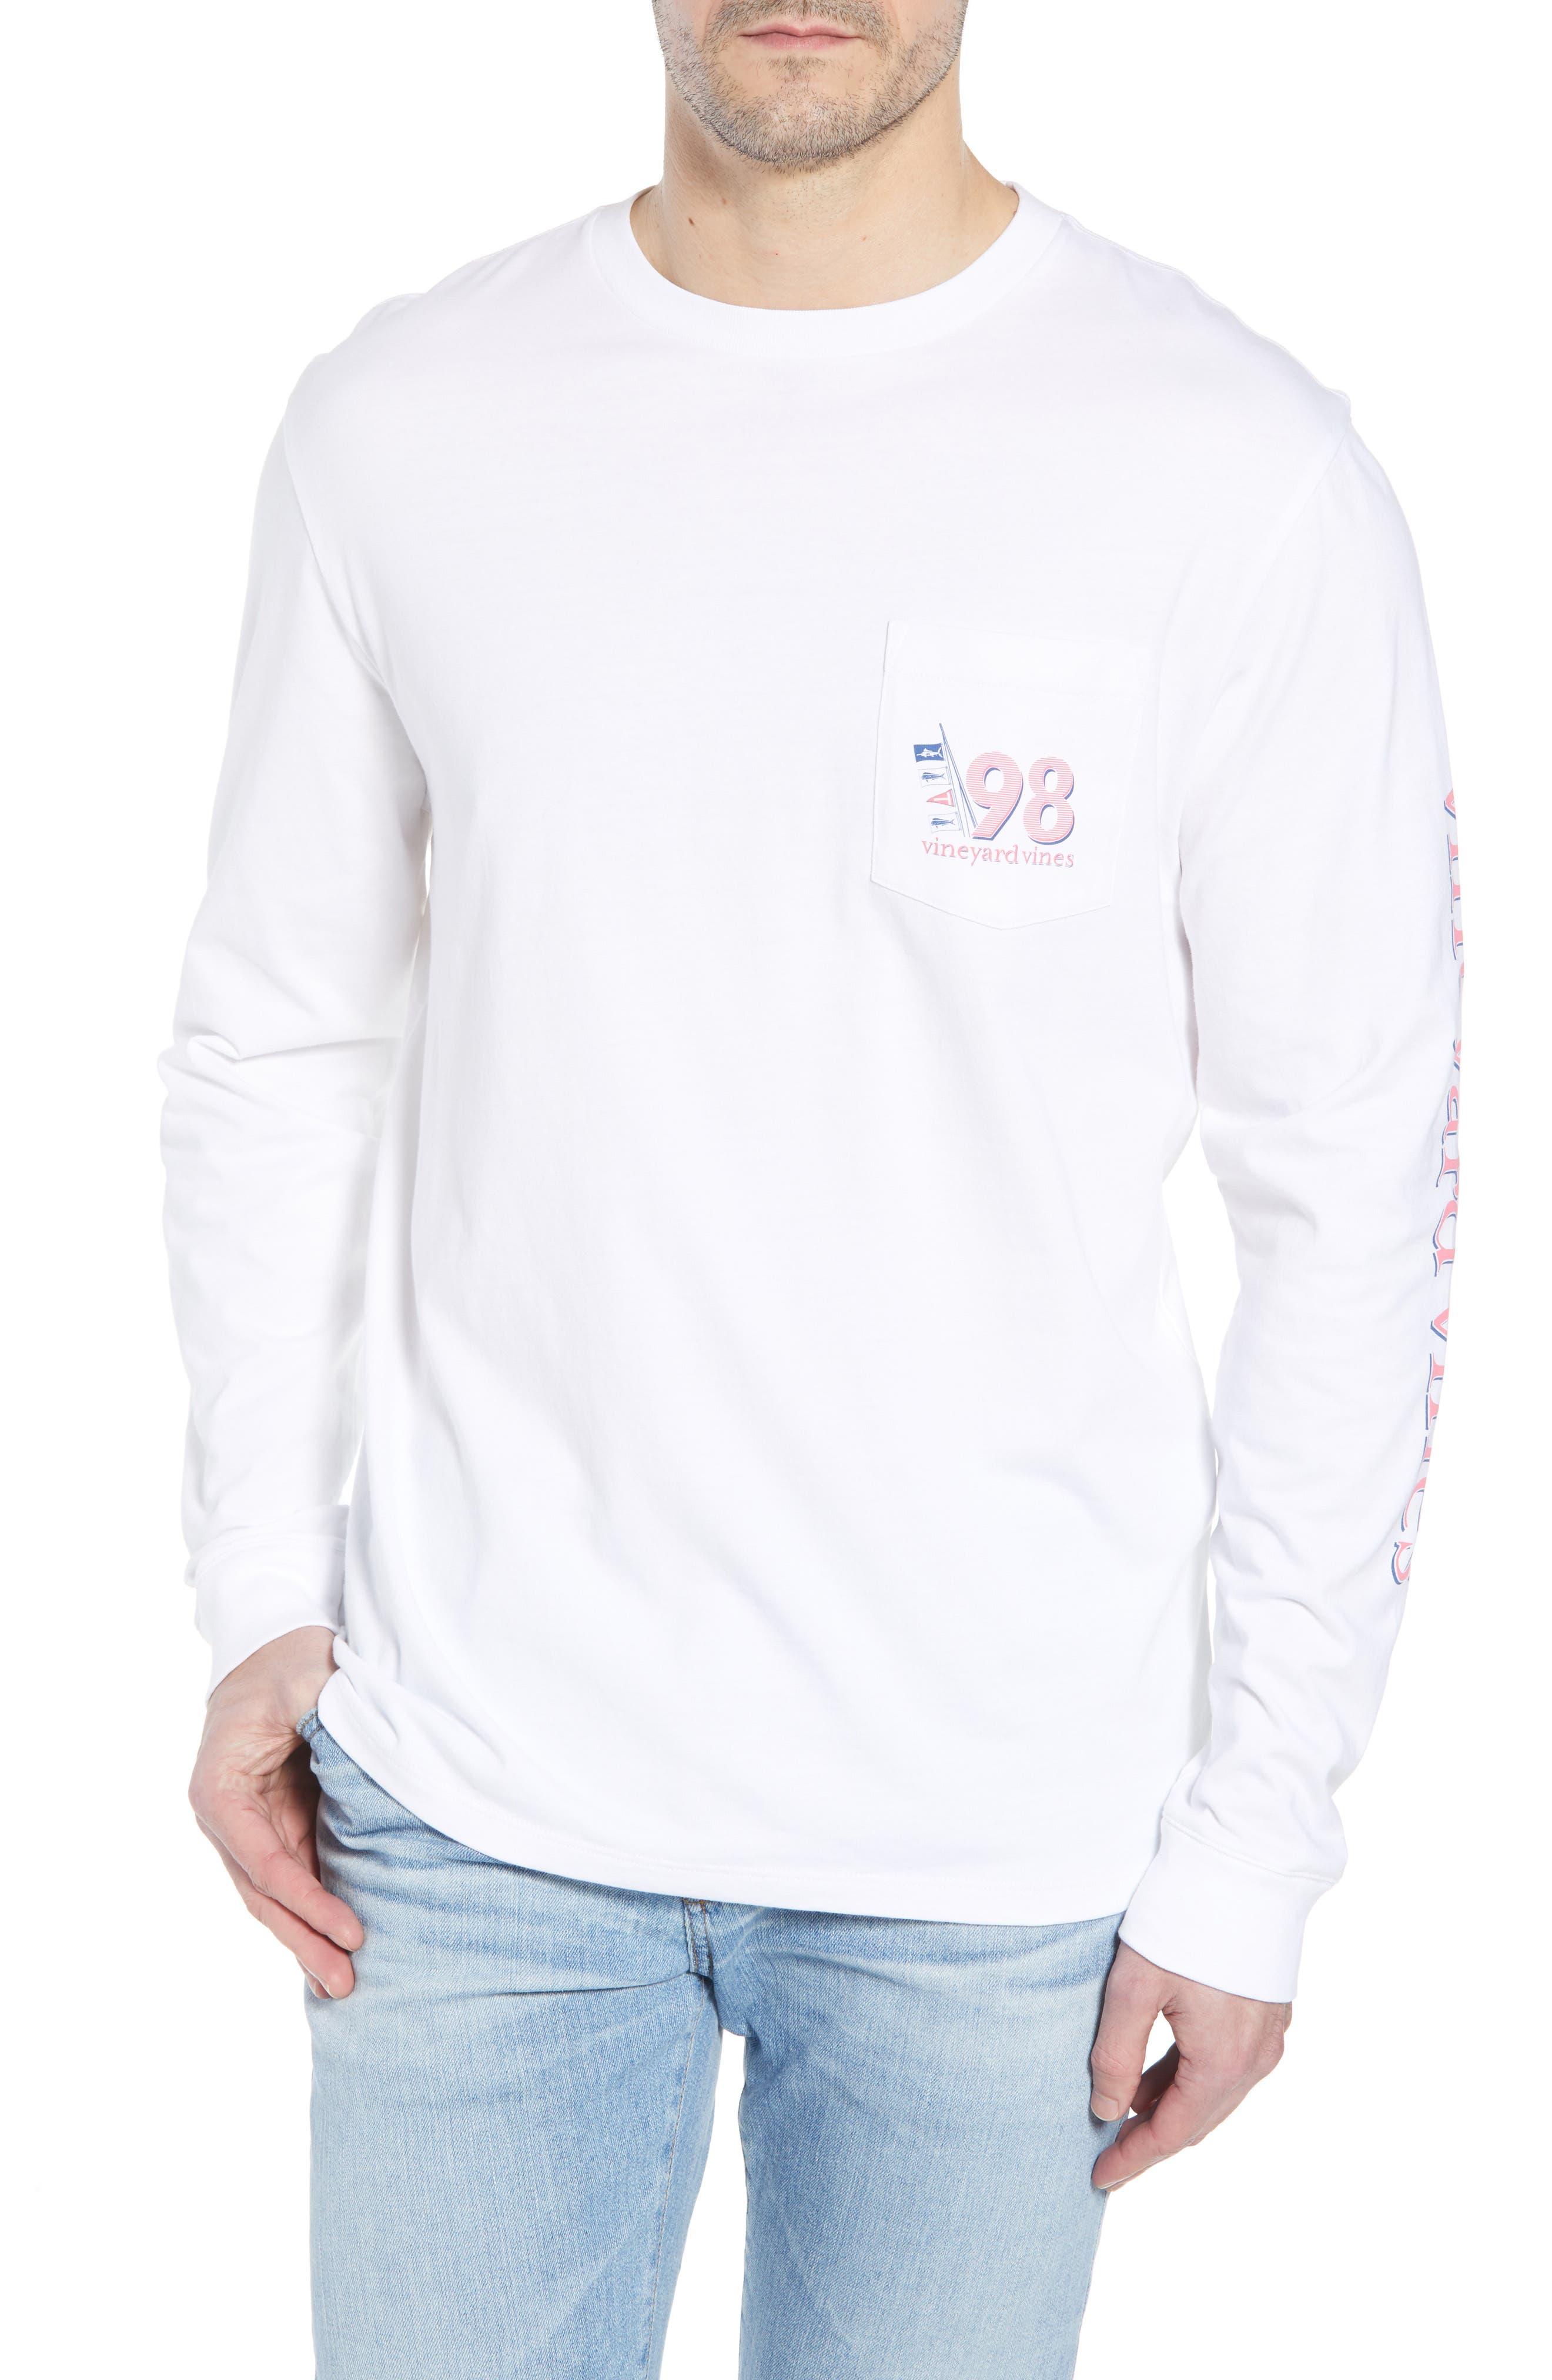 Sportfisher Regular Fit Crewneck T-Shirt,                             Main thumbnail 1, color,